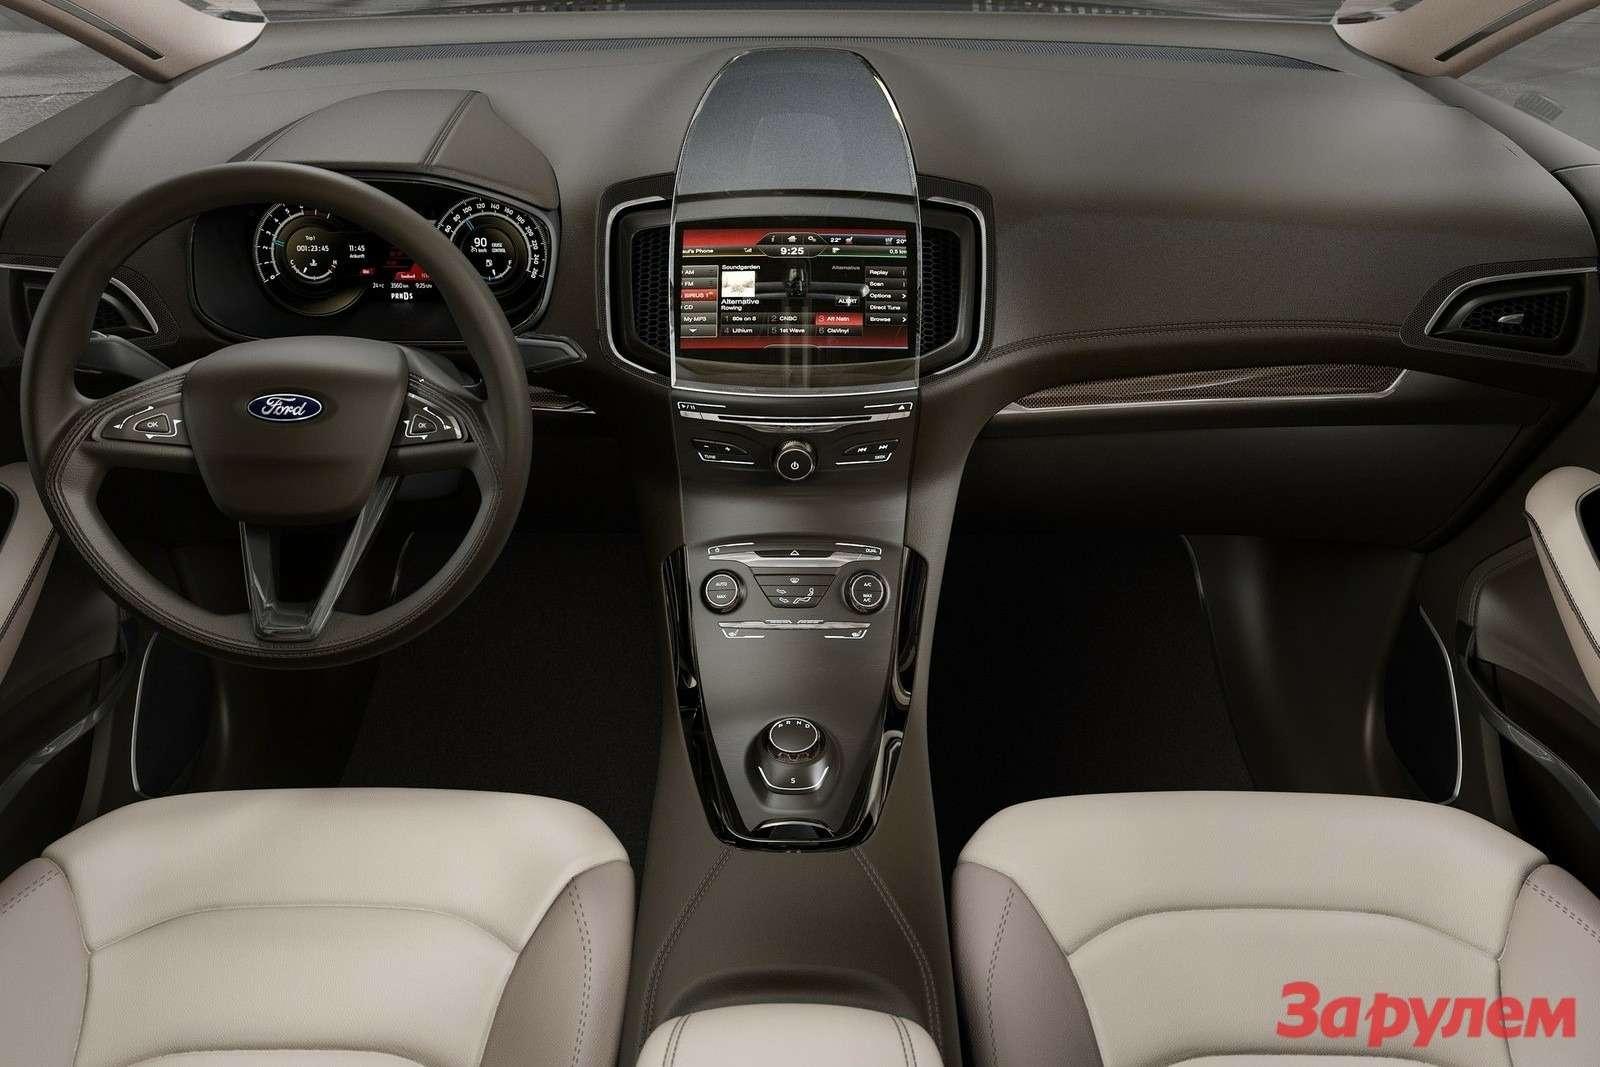 Ford-S-MAX_Concept_2013_1600x1200_wallpaper_13